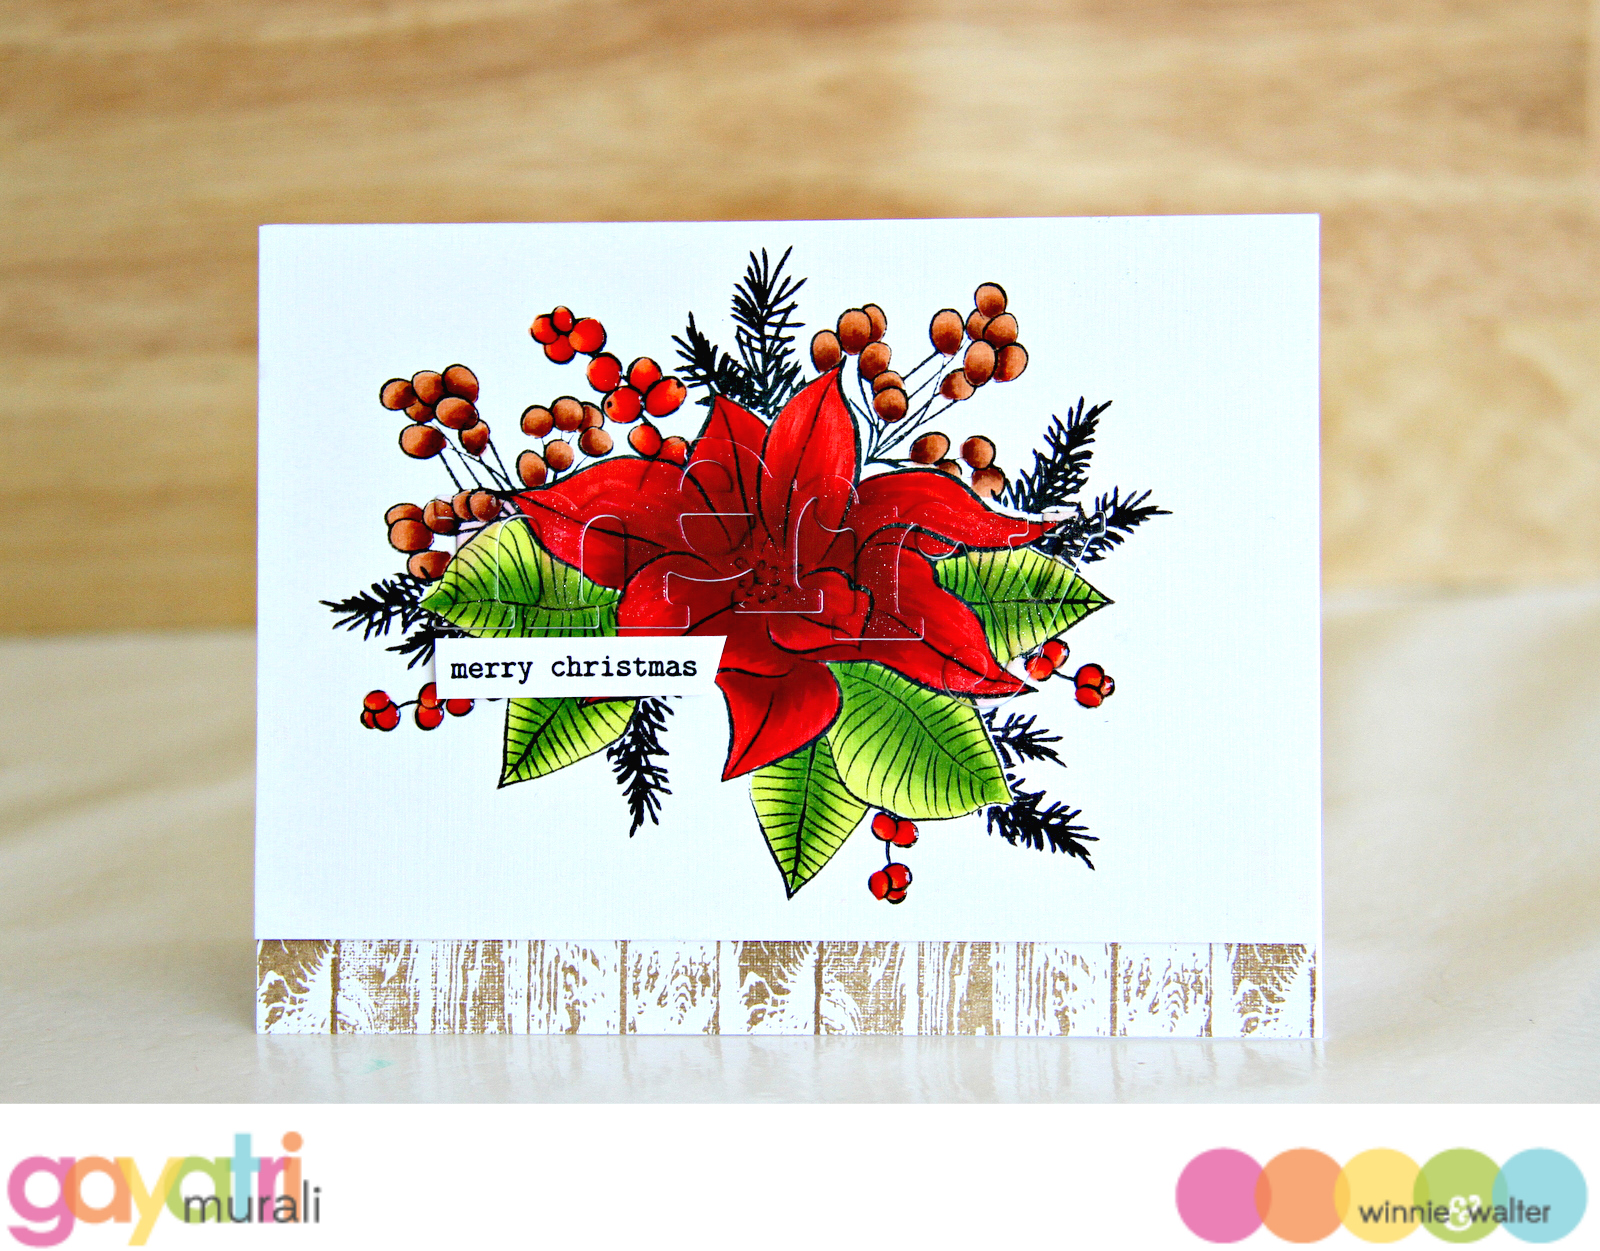 gayatri_Merry Merry Christmas#1